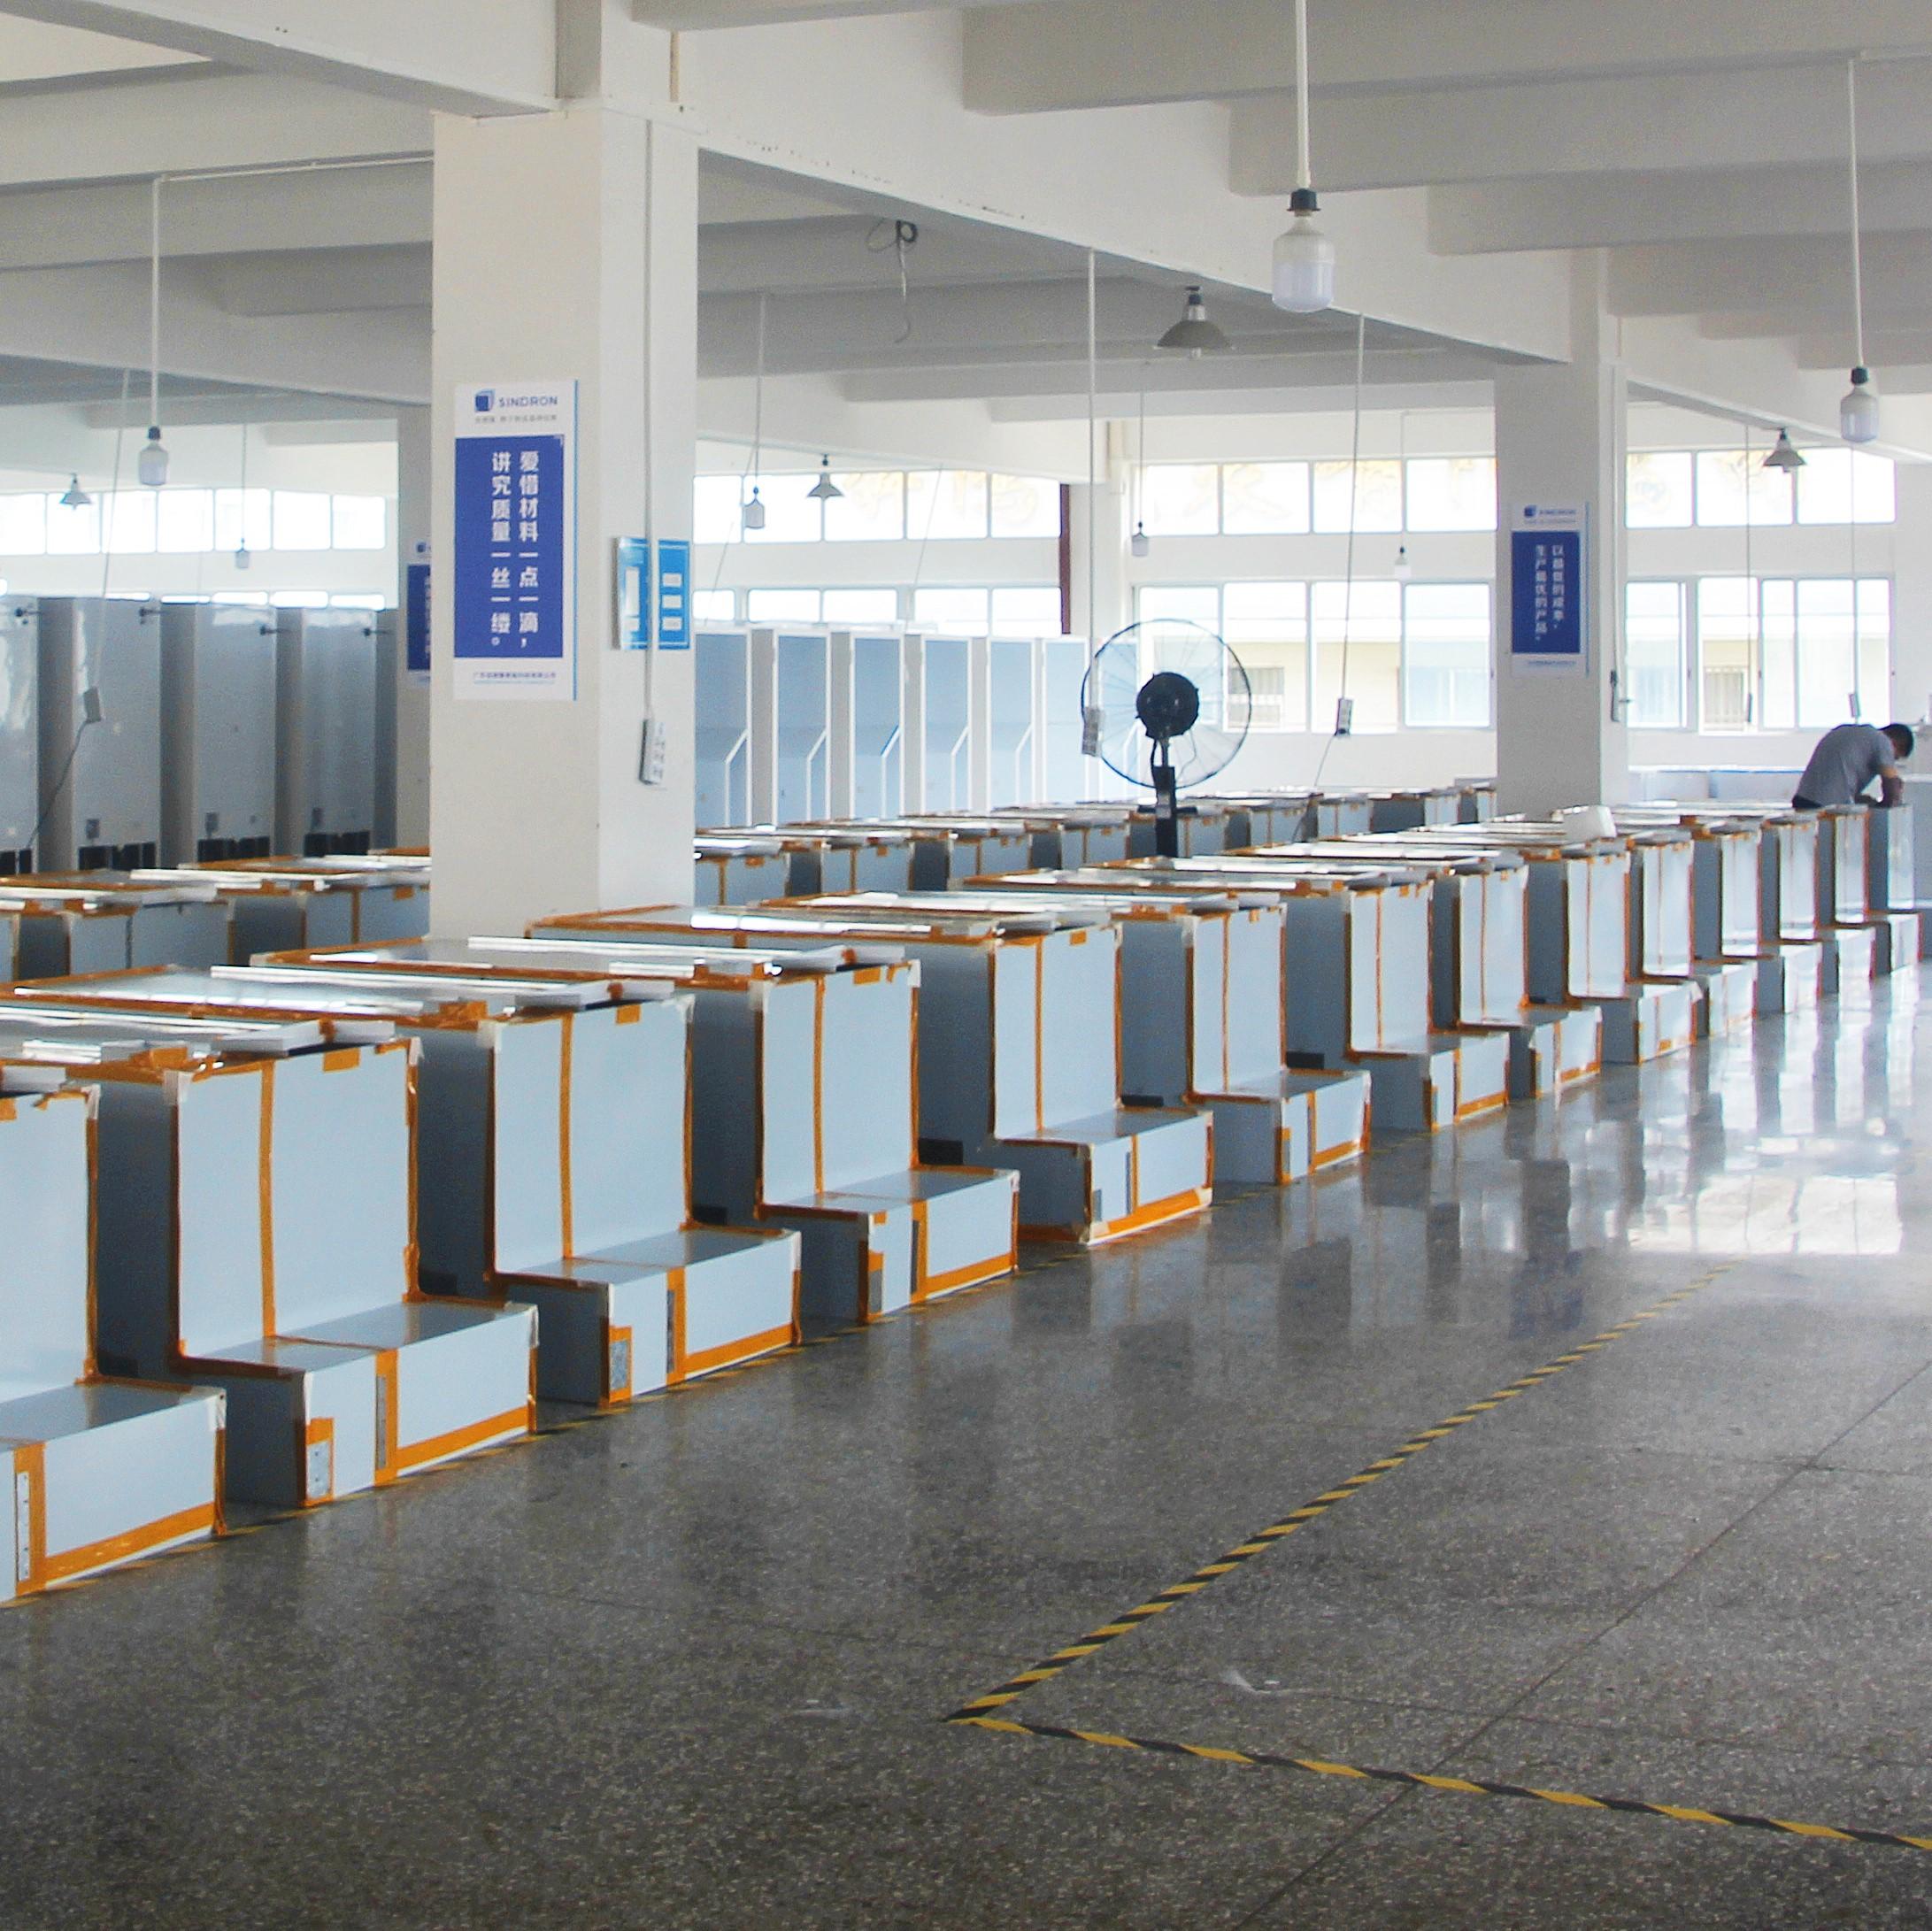 Vendlife Sindron vending mahine manufacturer in China